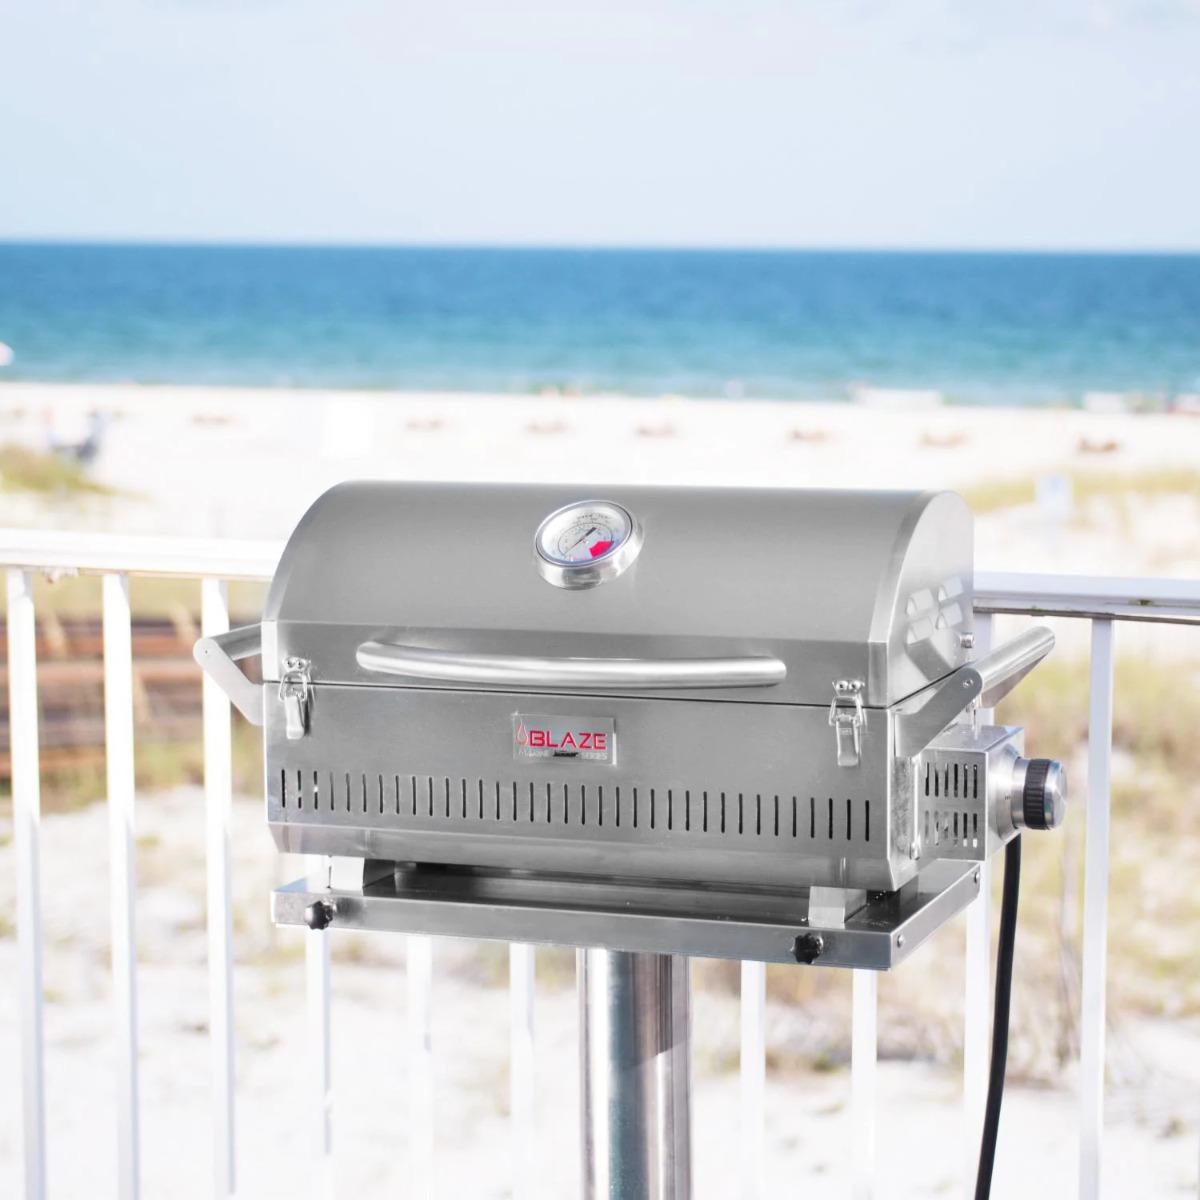 Blaze Professional LUX Marine Grade Portable Propane Gas Grill On Pedestal - blz-1pro-prtmg-lp+blz-prtped-mg10